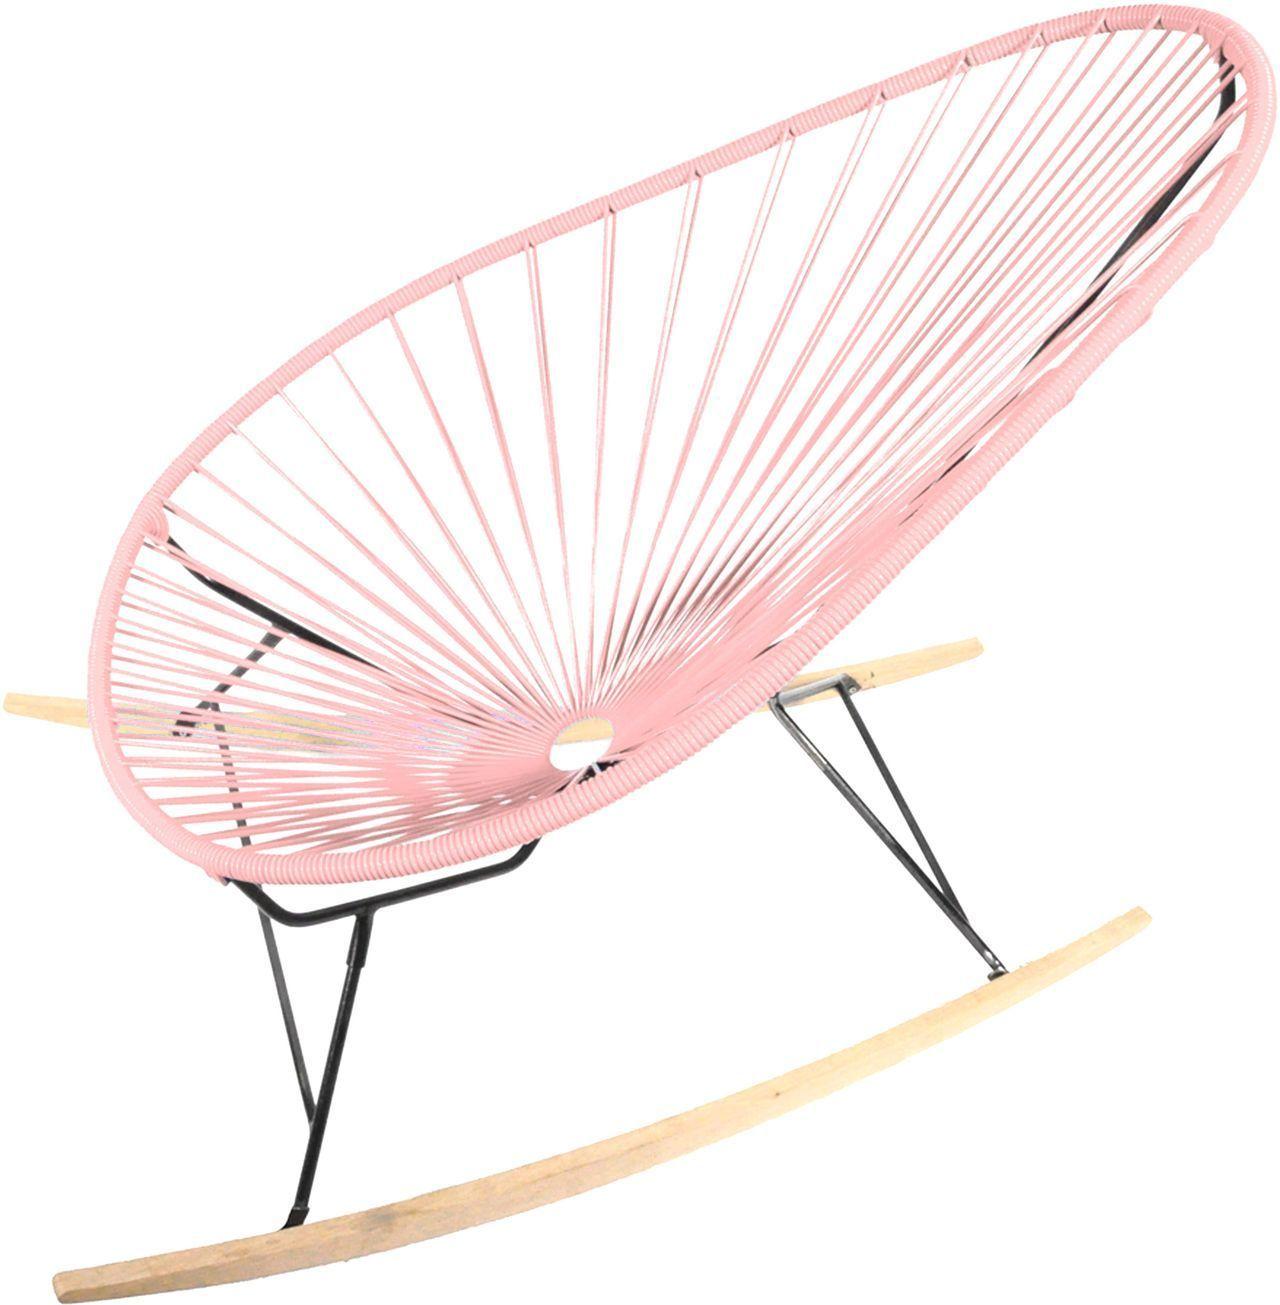 acapulco chair wood rocker design schaukelstuhl boqa. Black Bedroom Furniture Sets. Home Design Ideas